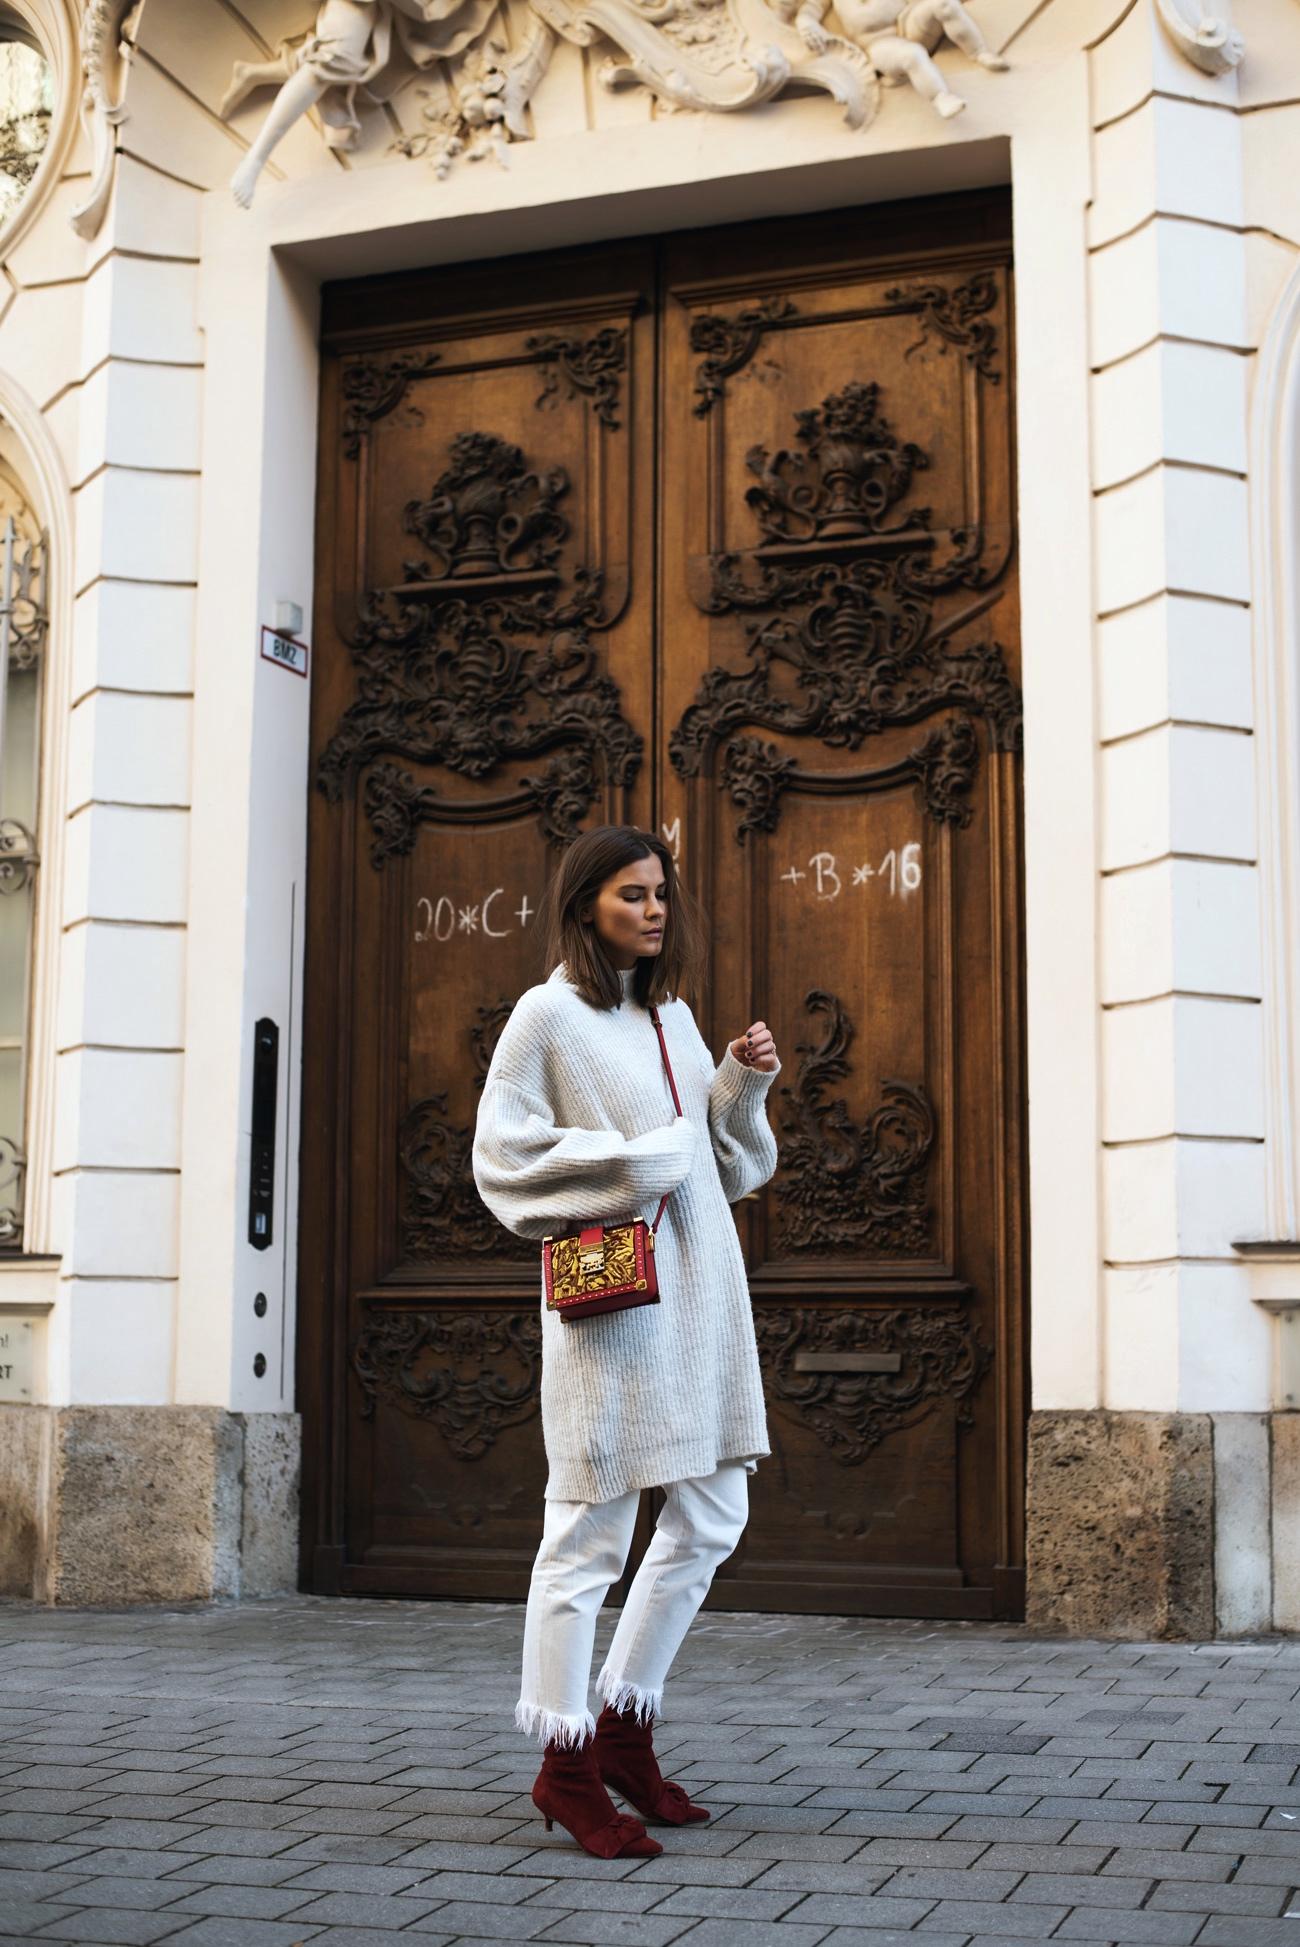 fashionblog-deutschland-muenchen-mode-blog-nina-fashiioncarpet